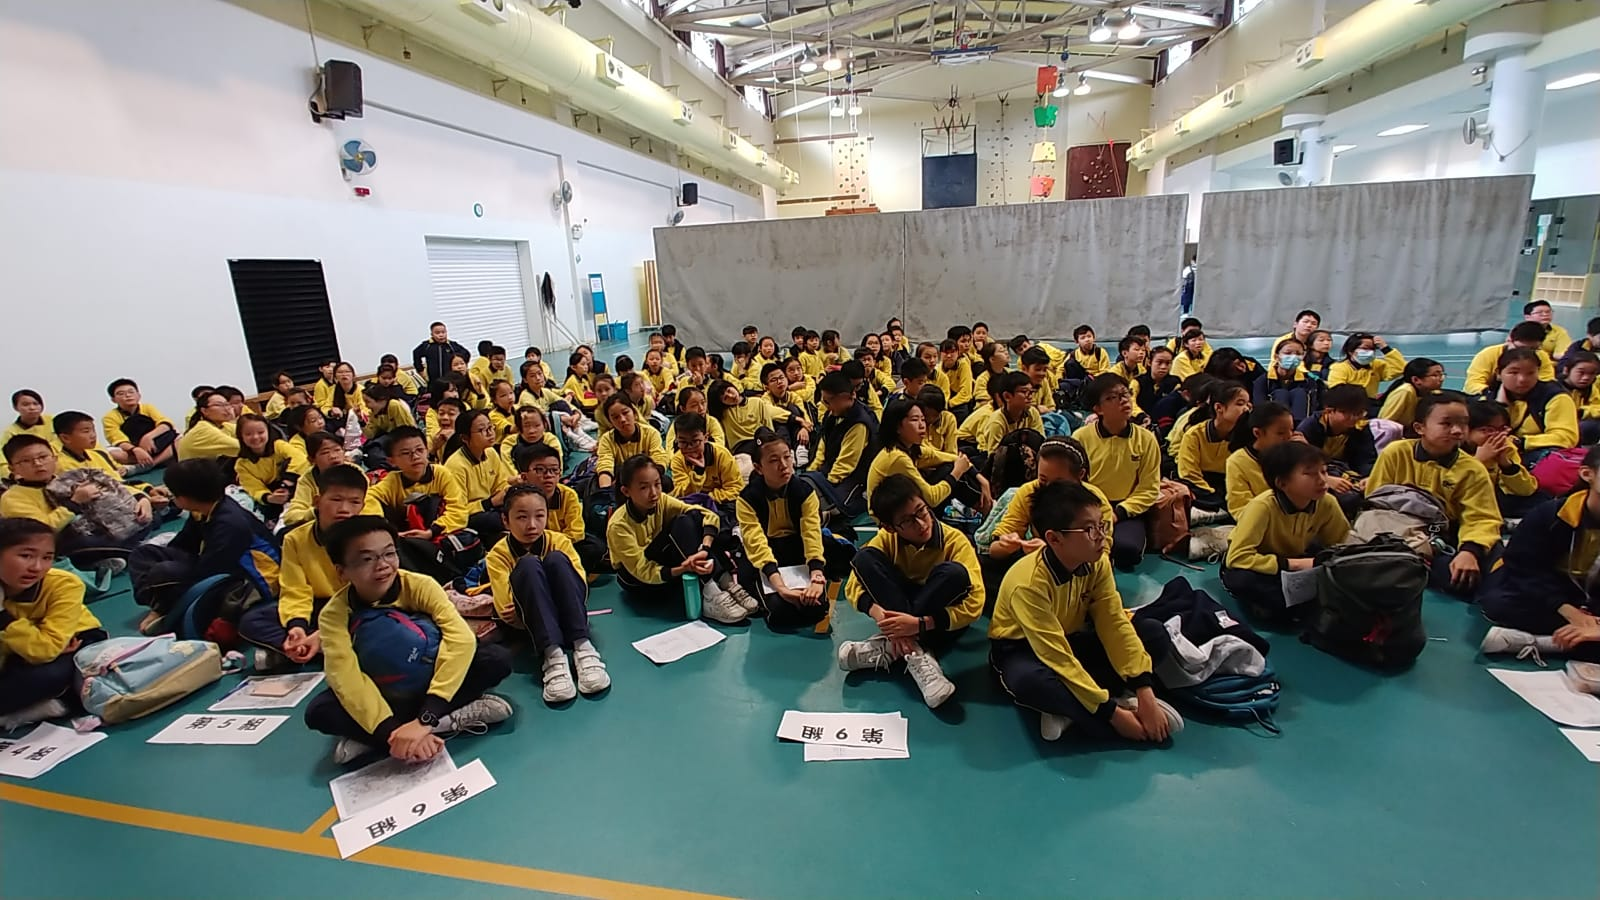 https://www.plkcjy.edu.hk/sites/default/files/whatsapp_image_2019-12-21_at_14.04.21_2.jpeg